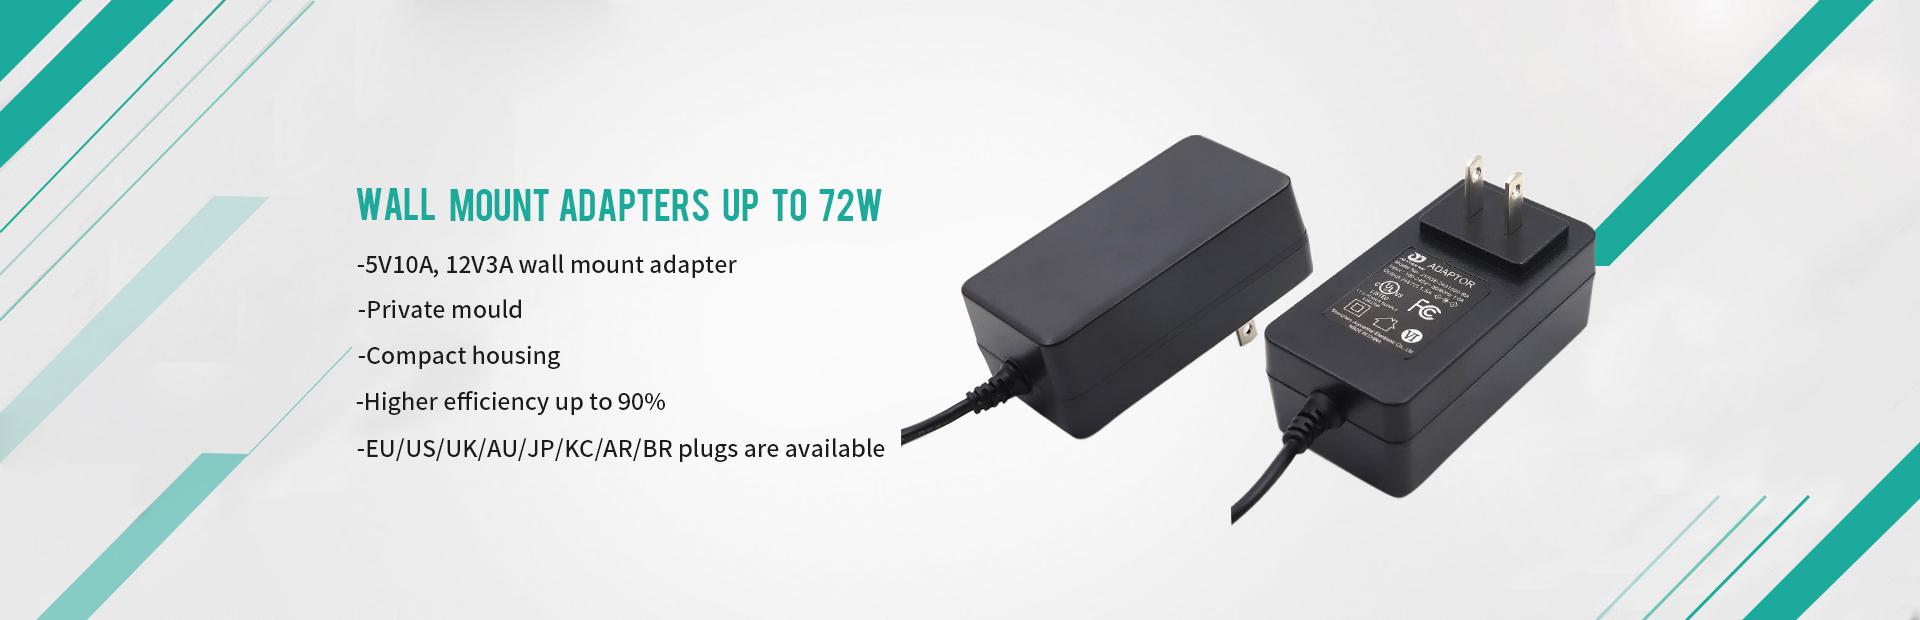 CHARGEUR AC 12//24V MICRO USB 2.4A AVEC CABLE NON SEPARE 1.2M